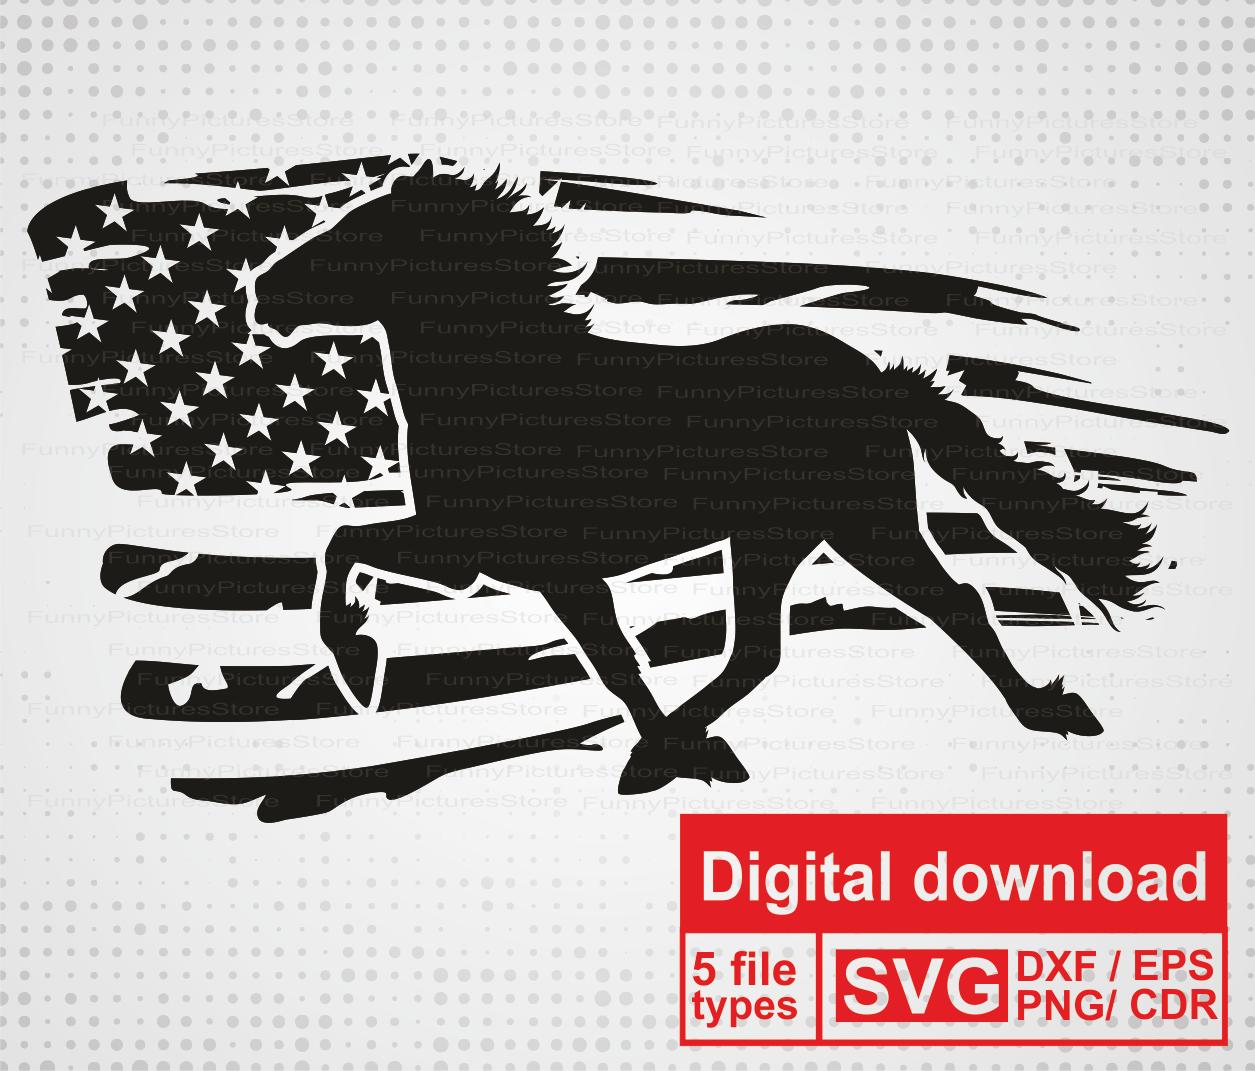 Horse Silhouette Svg Vector Distressed Flag American Flag Svg Files For Cut Print Engrav Cricut Plotter Cutting Horse Sticker Vector